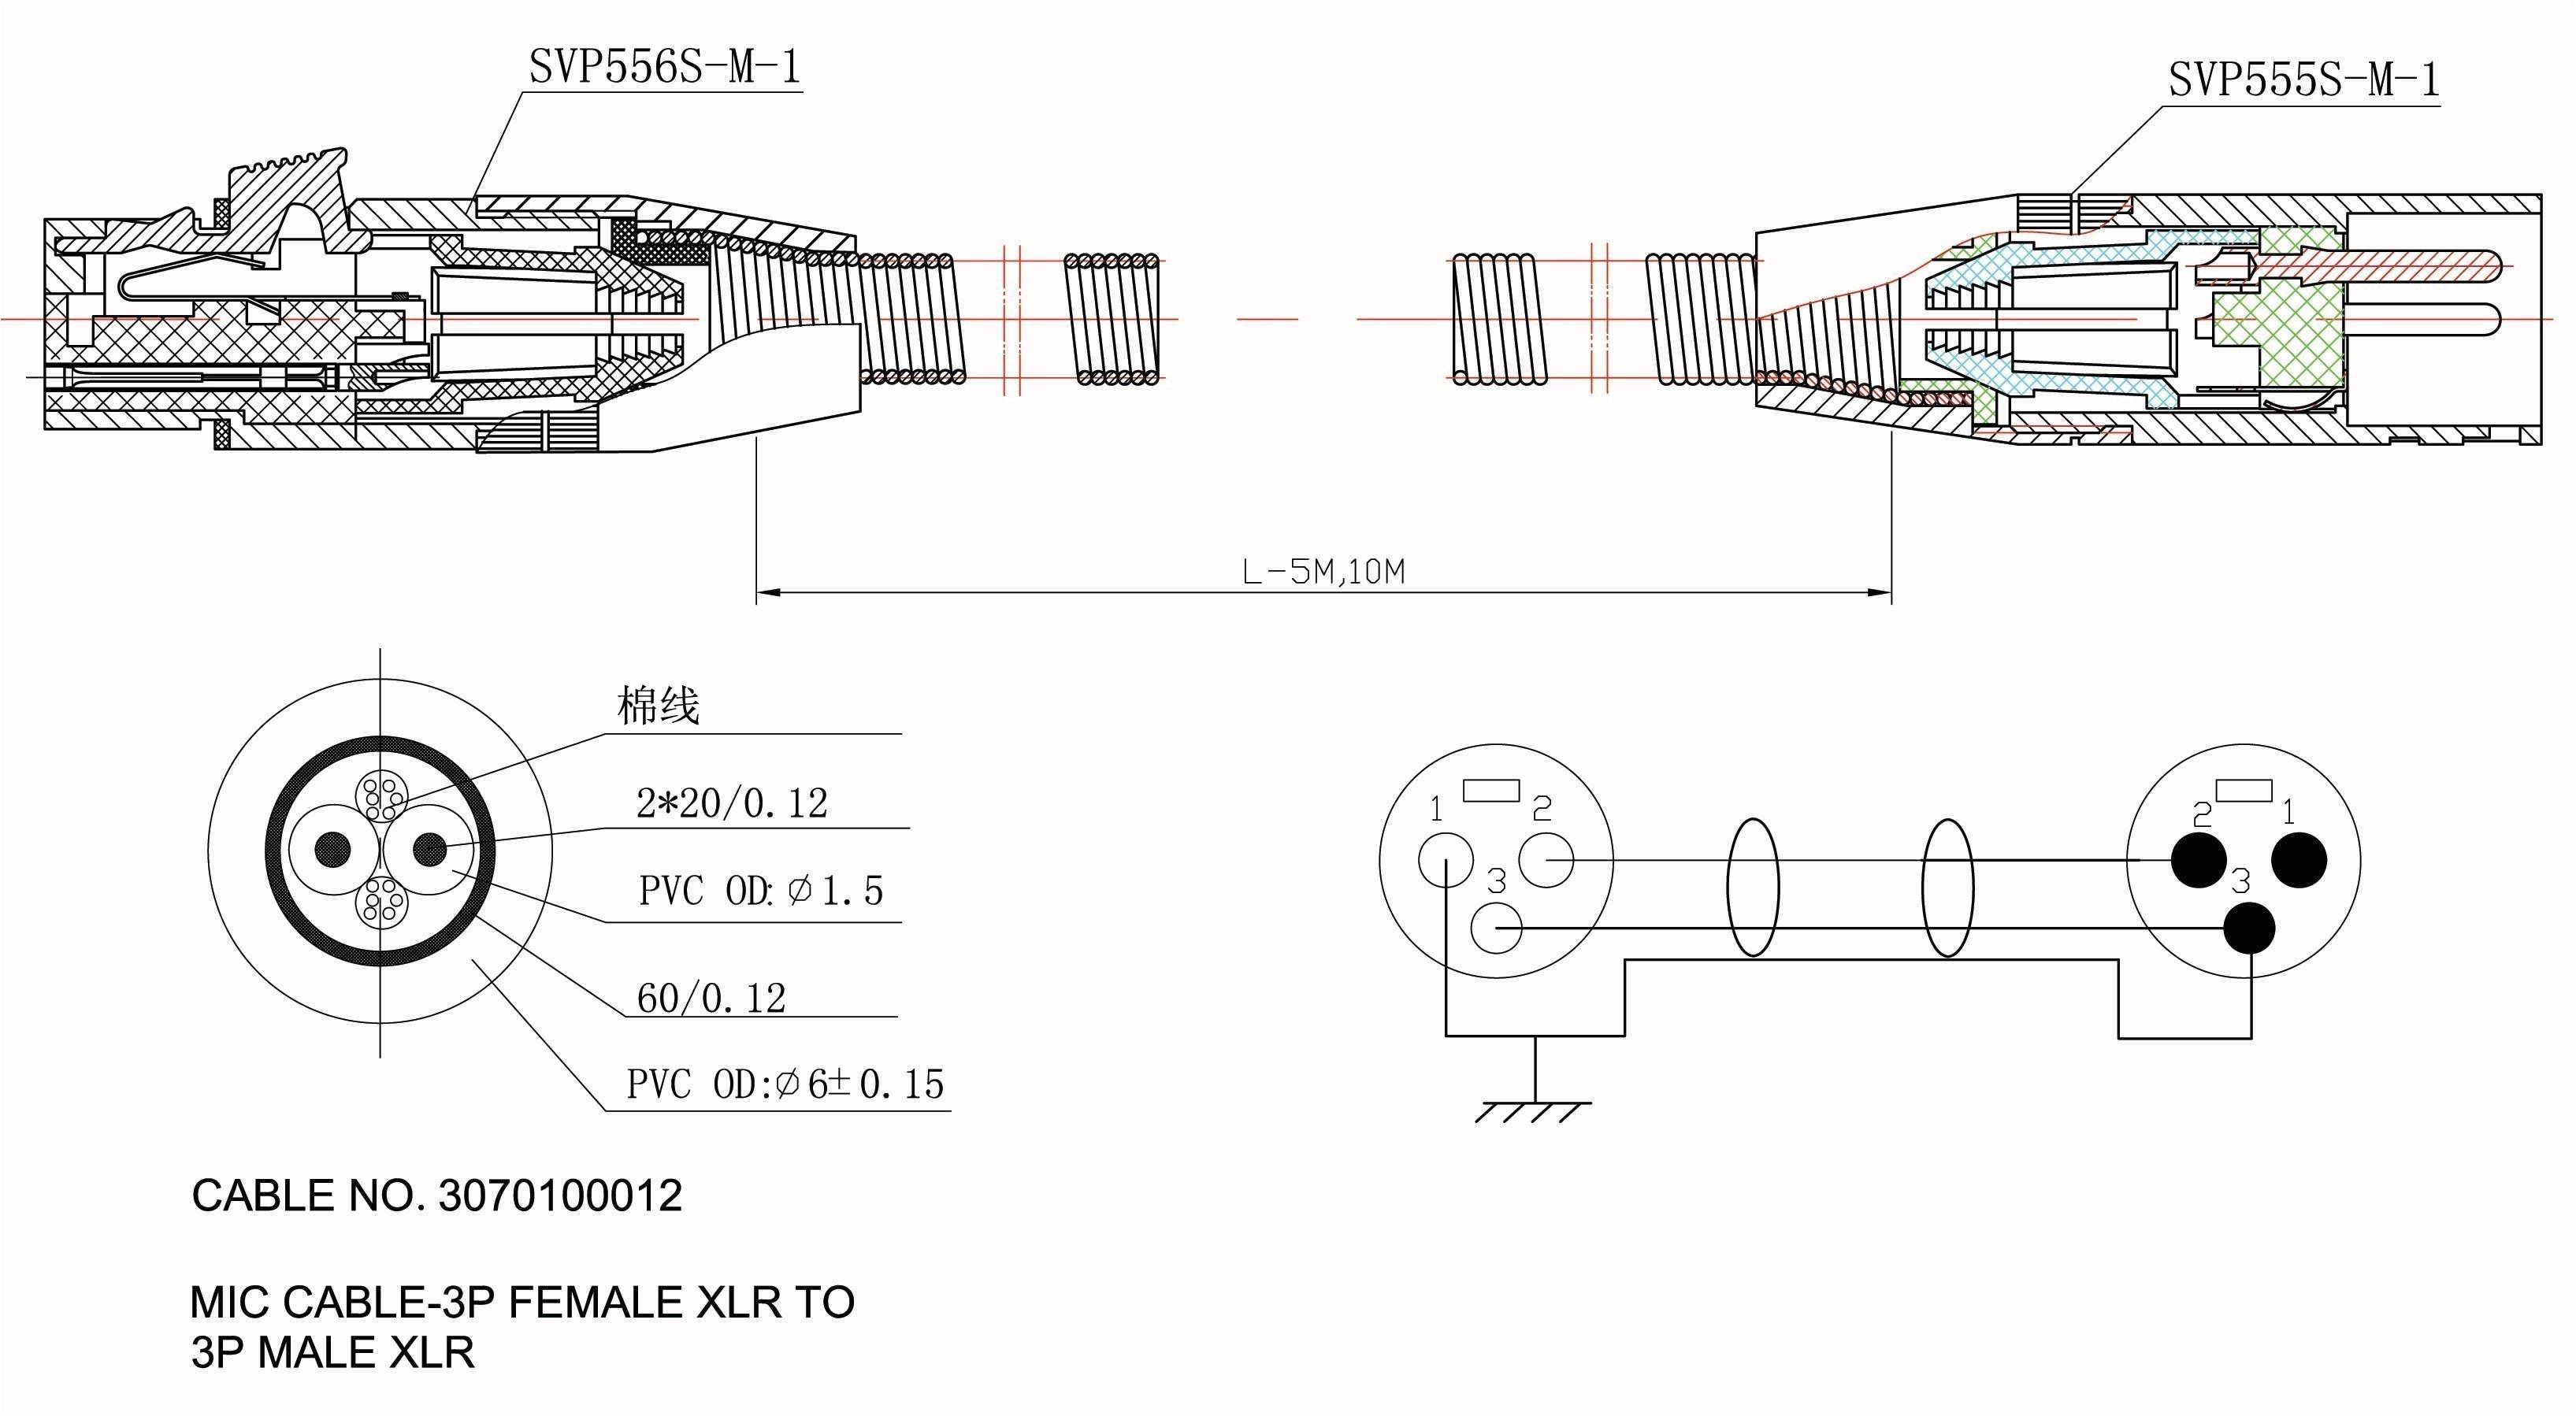 m1009 fuse box wiring diagram m1009 fuse diagram wiring diagrams wd